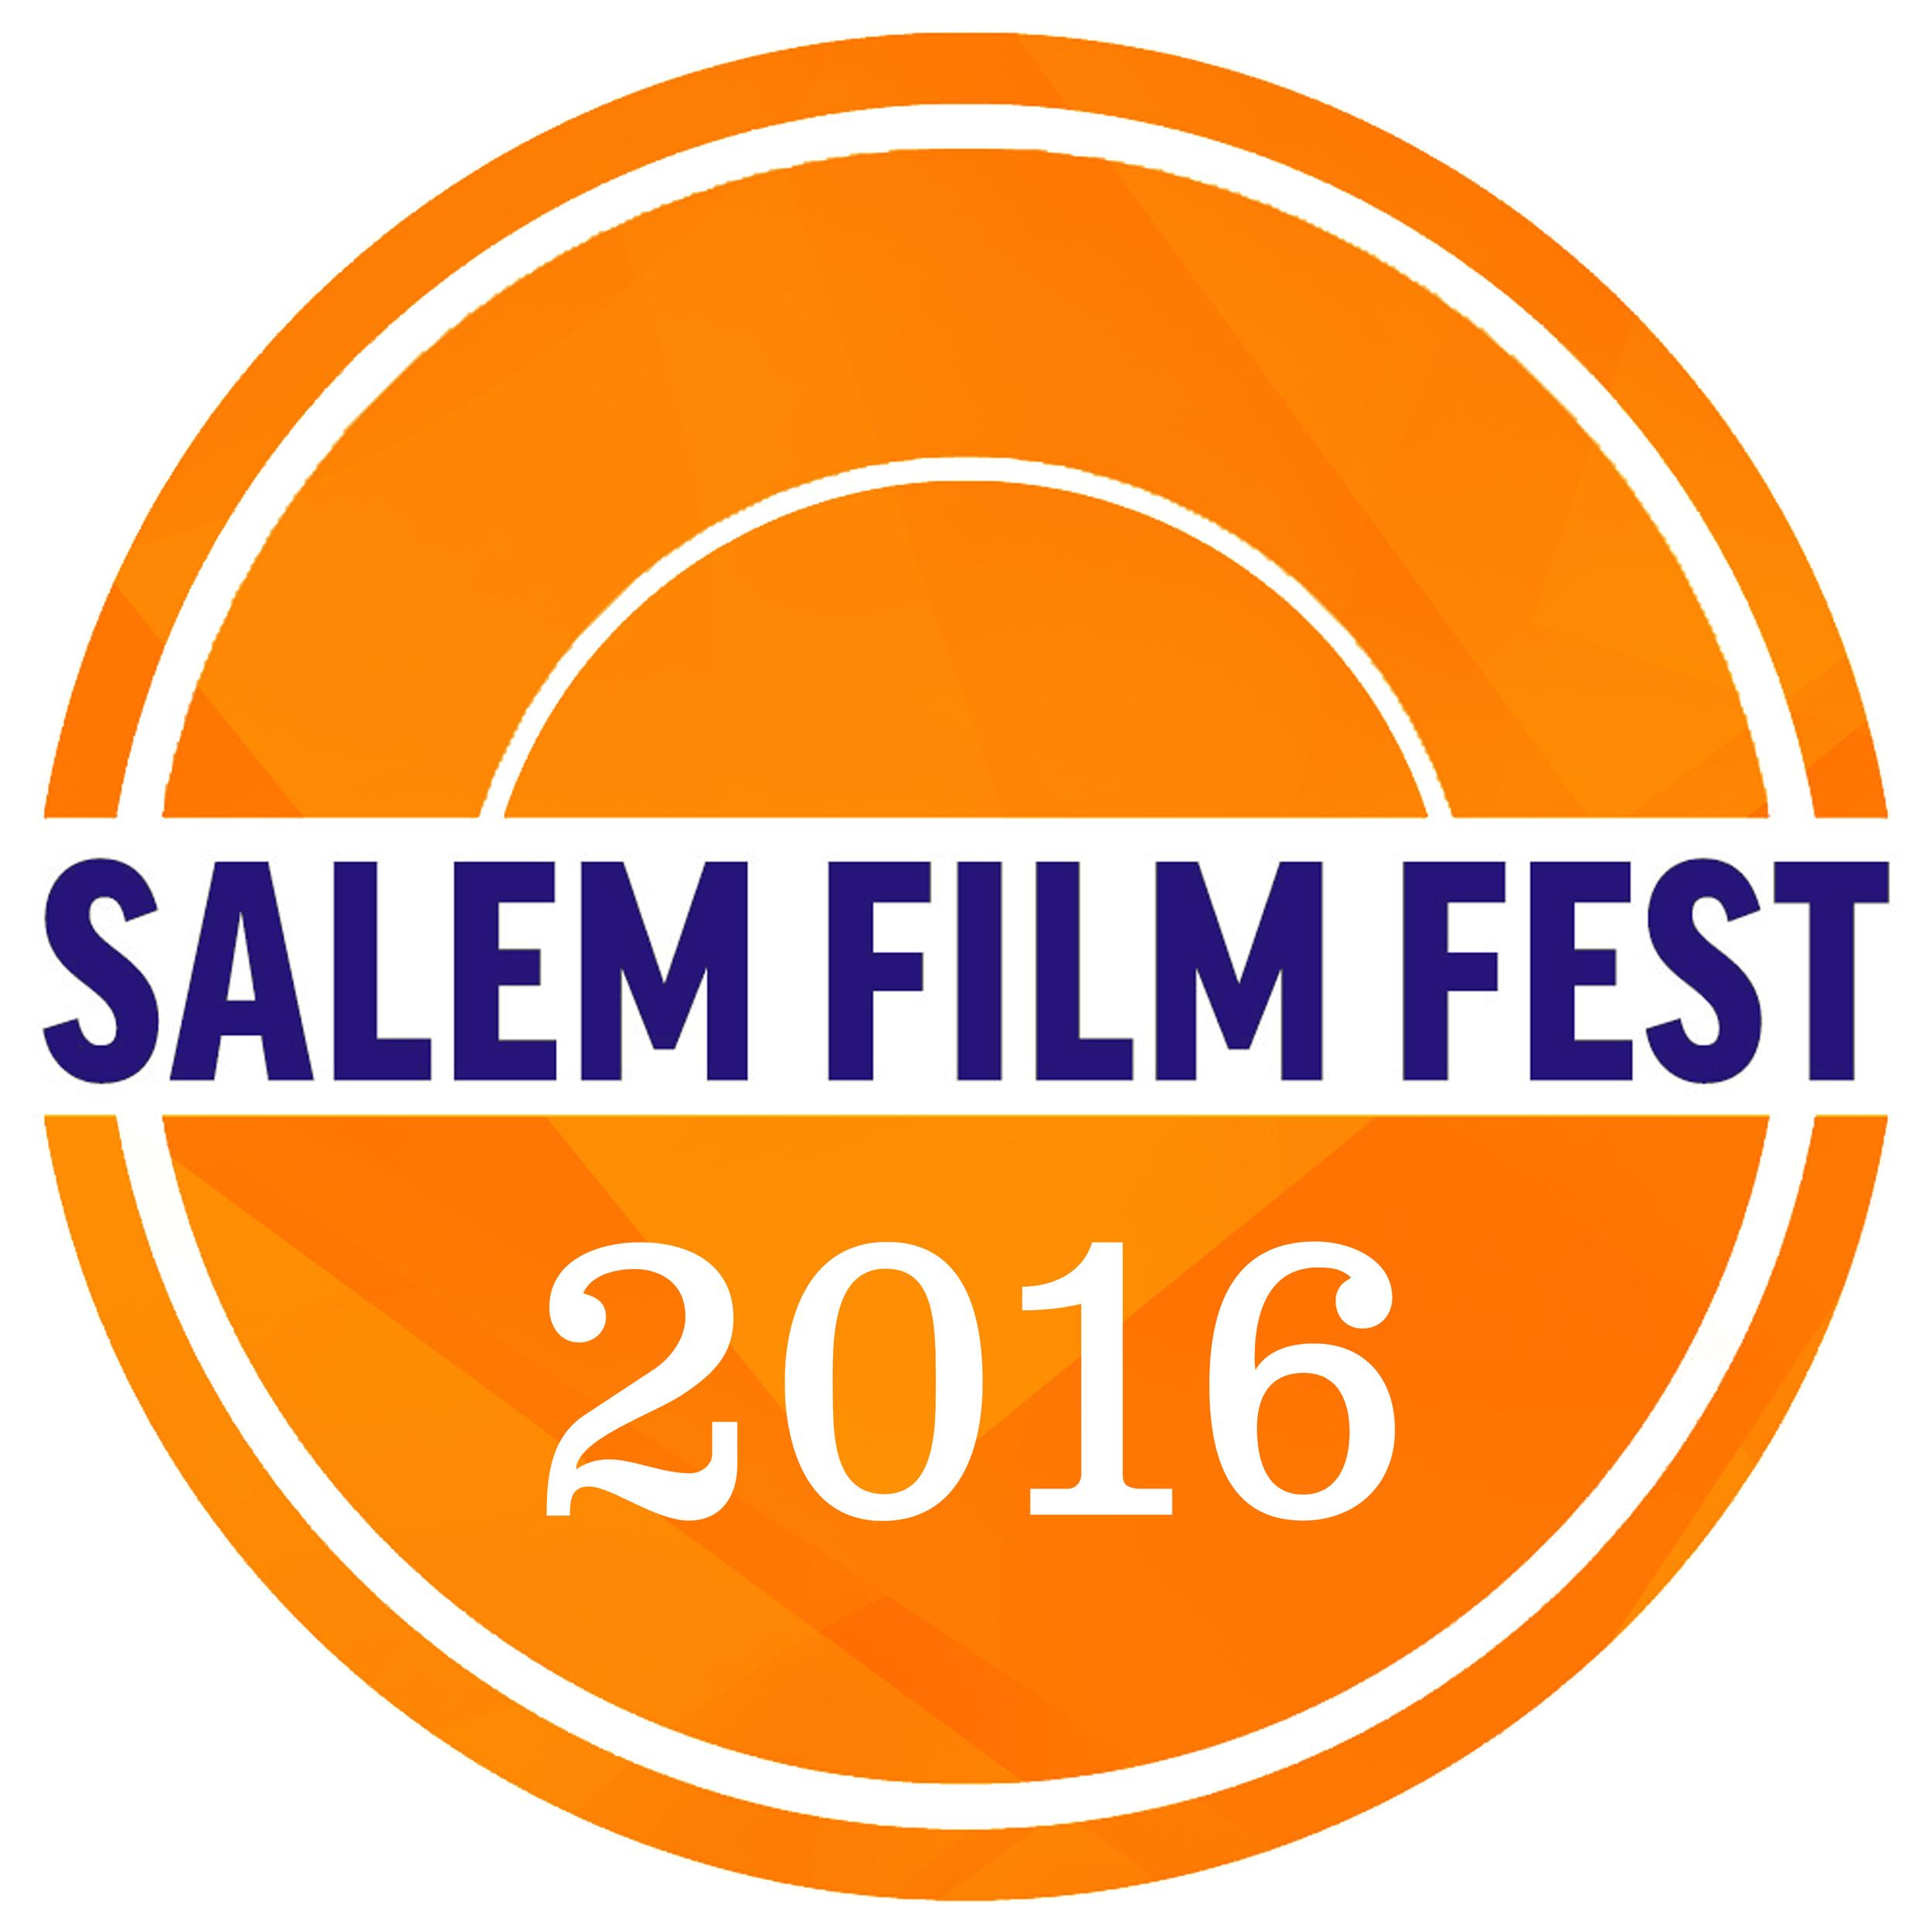 Salem Film Fest 2016